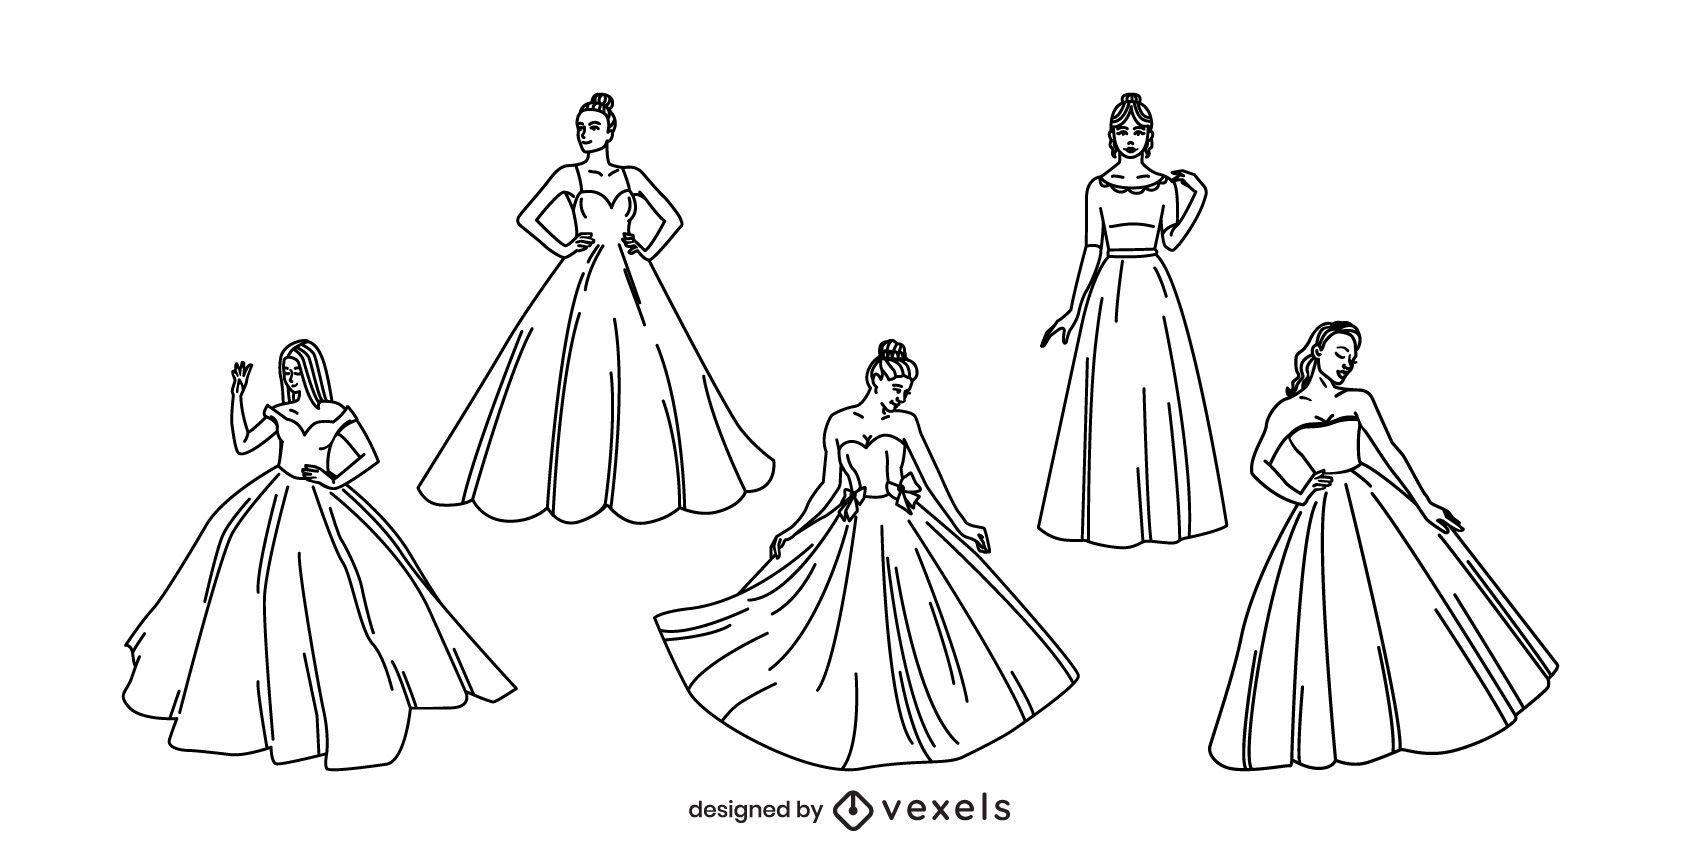 Conjunto feminino com vestidos de gala